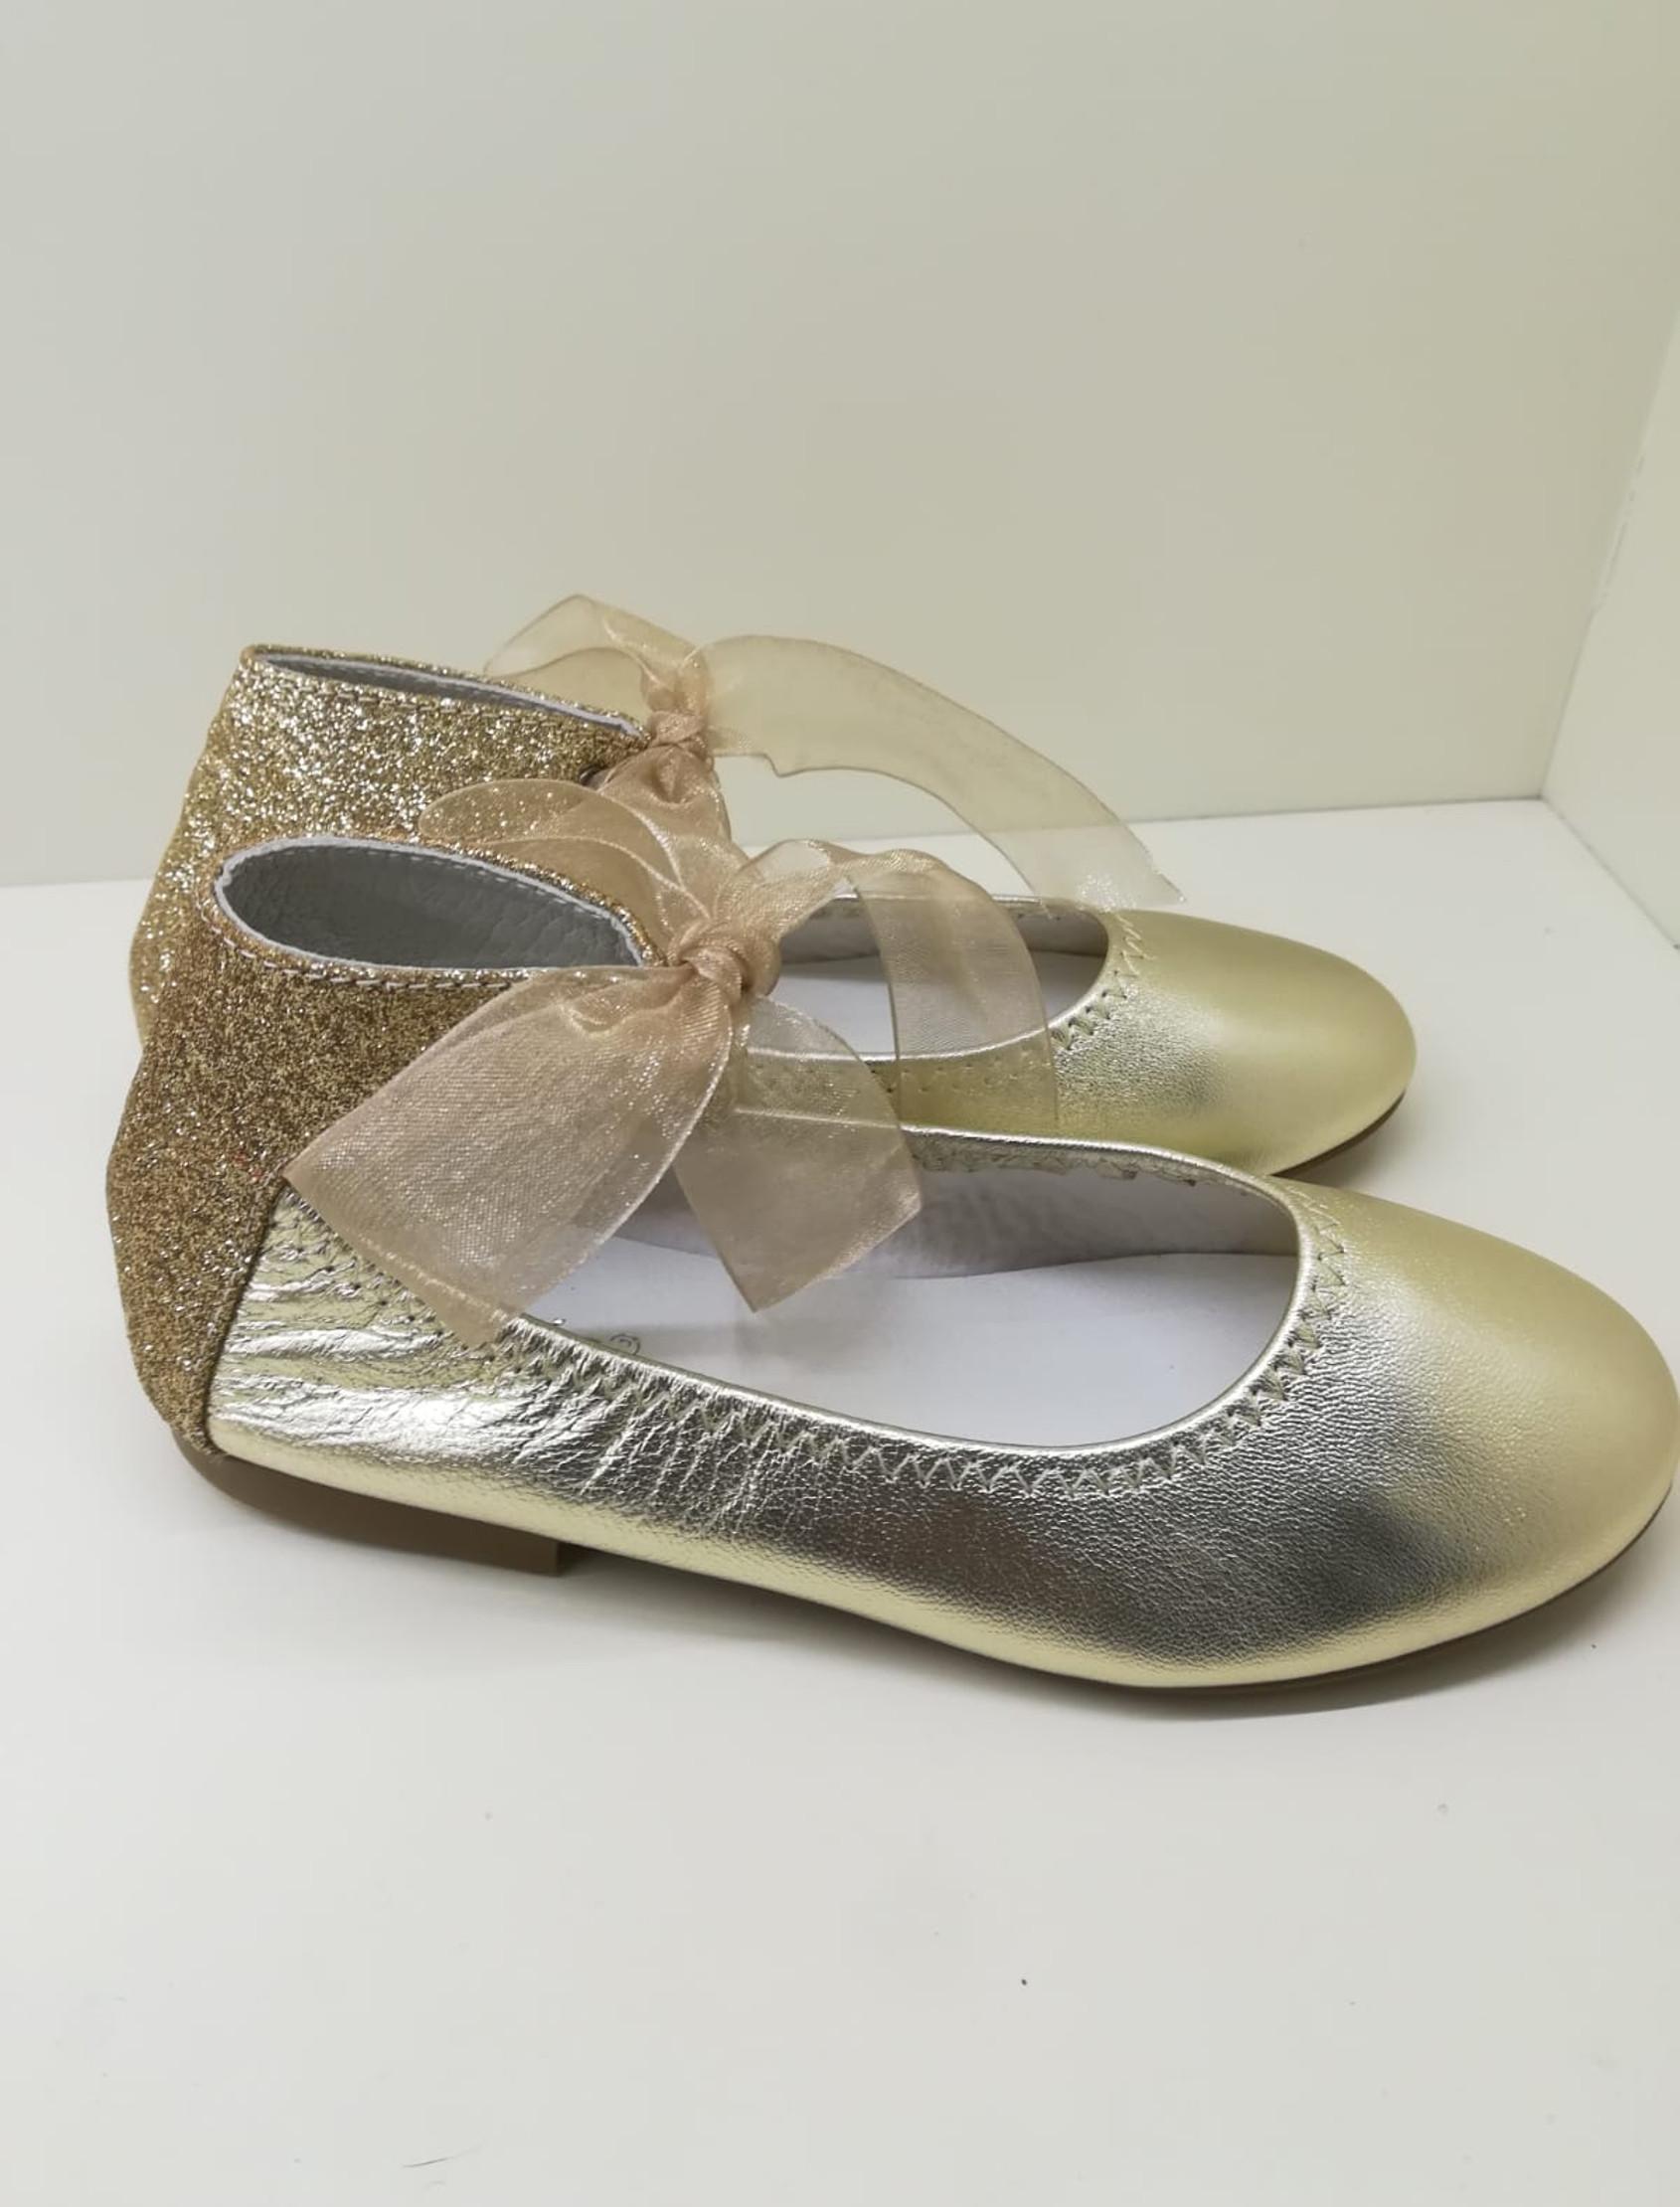 Bailarina en laminado oro con trasera en glitter oro. Ata al tobillo con lazo de organza.